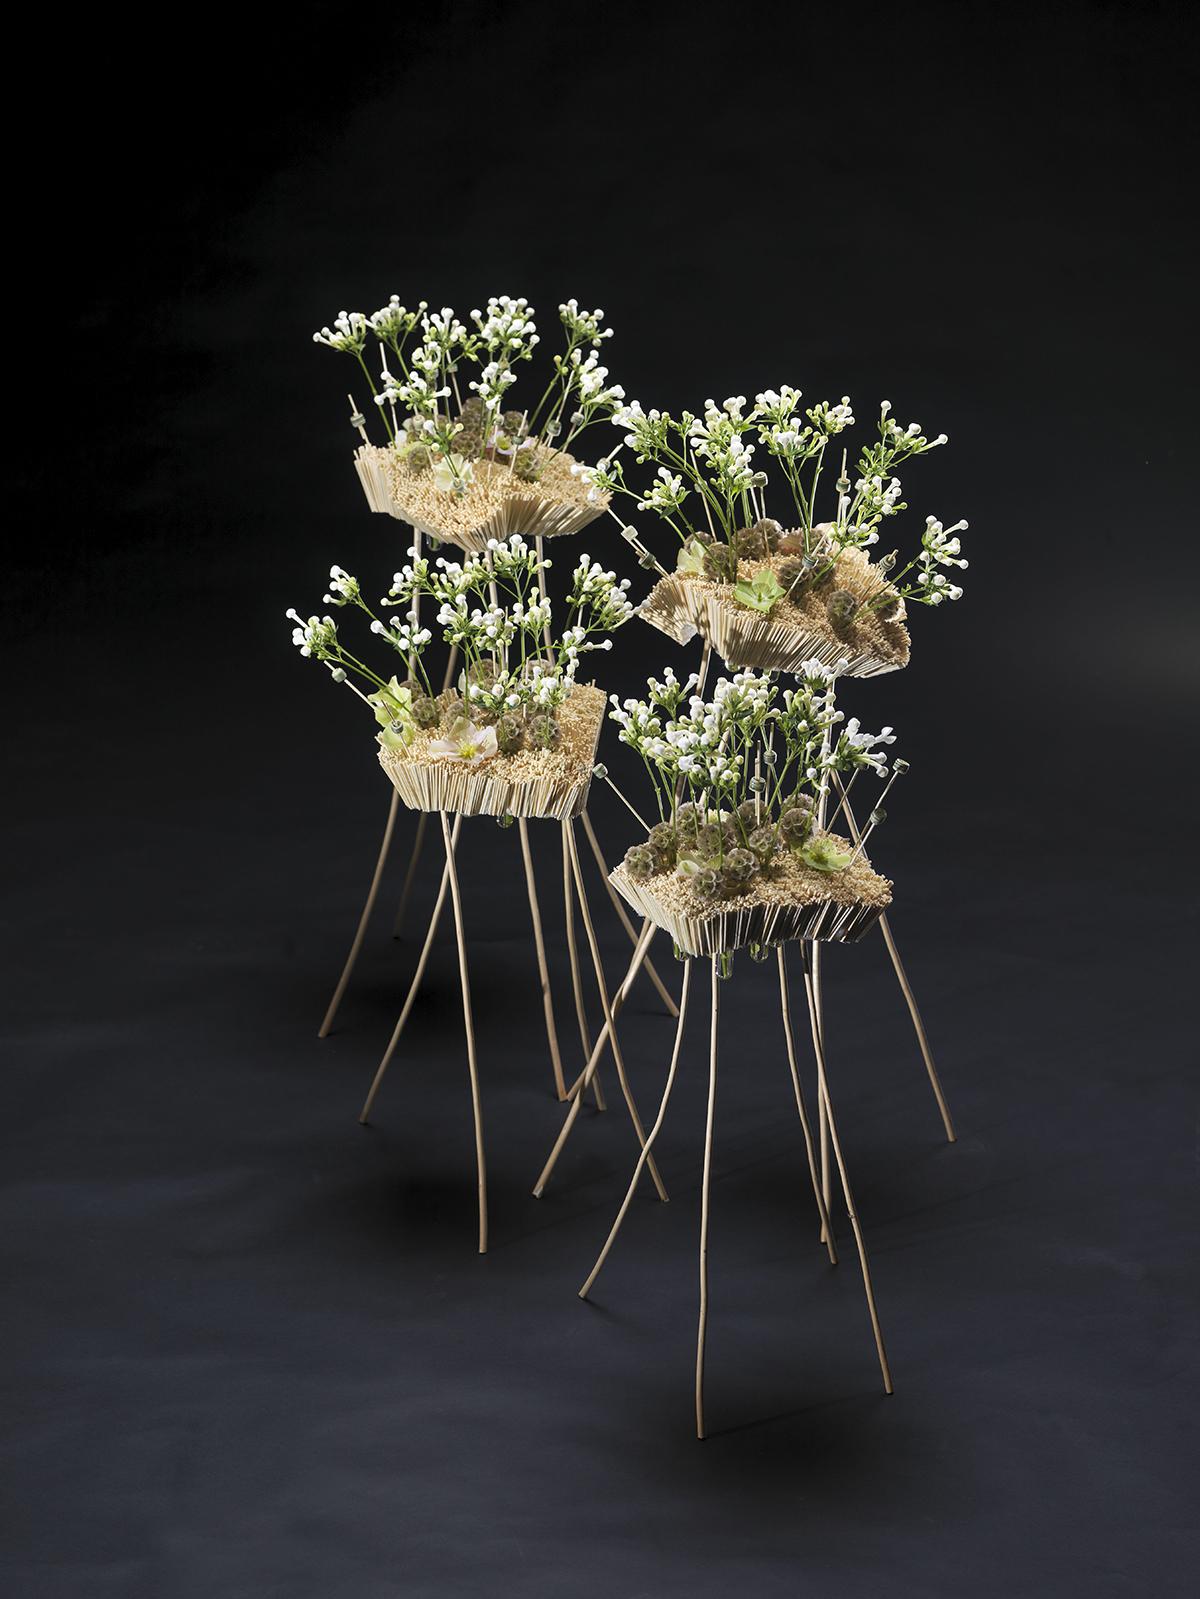 Making everyday life extraordinary - with flowers | pim van den.